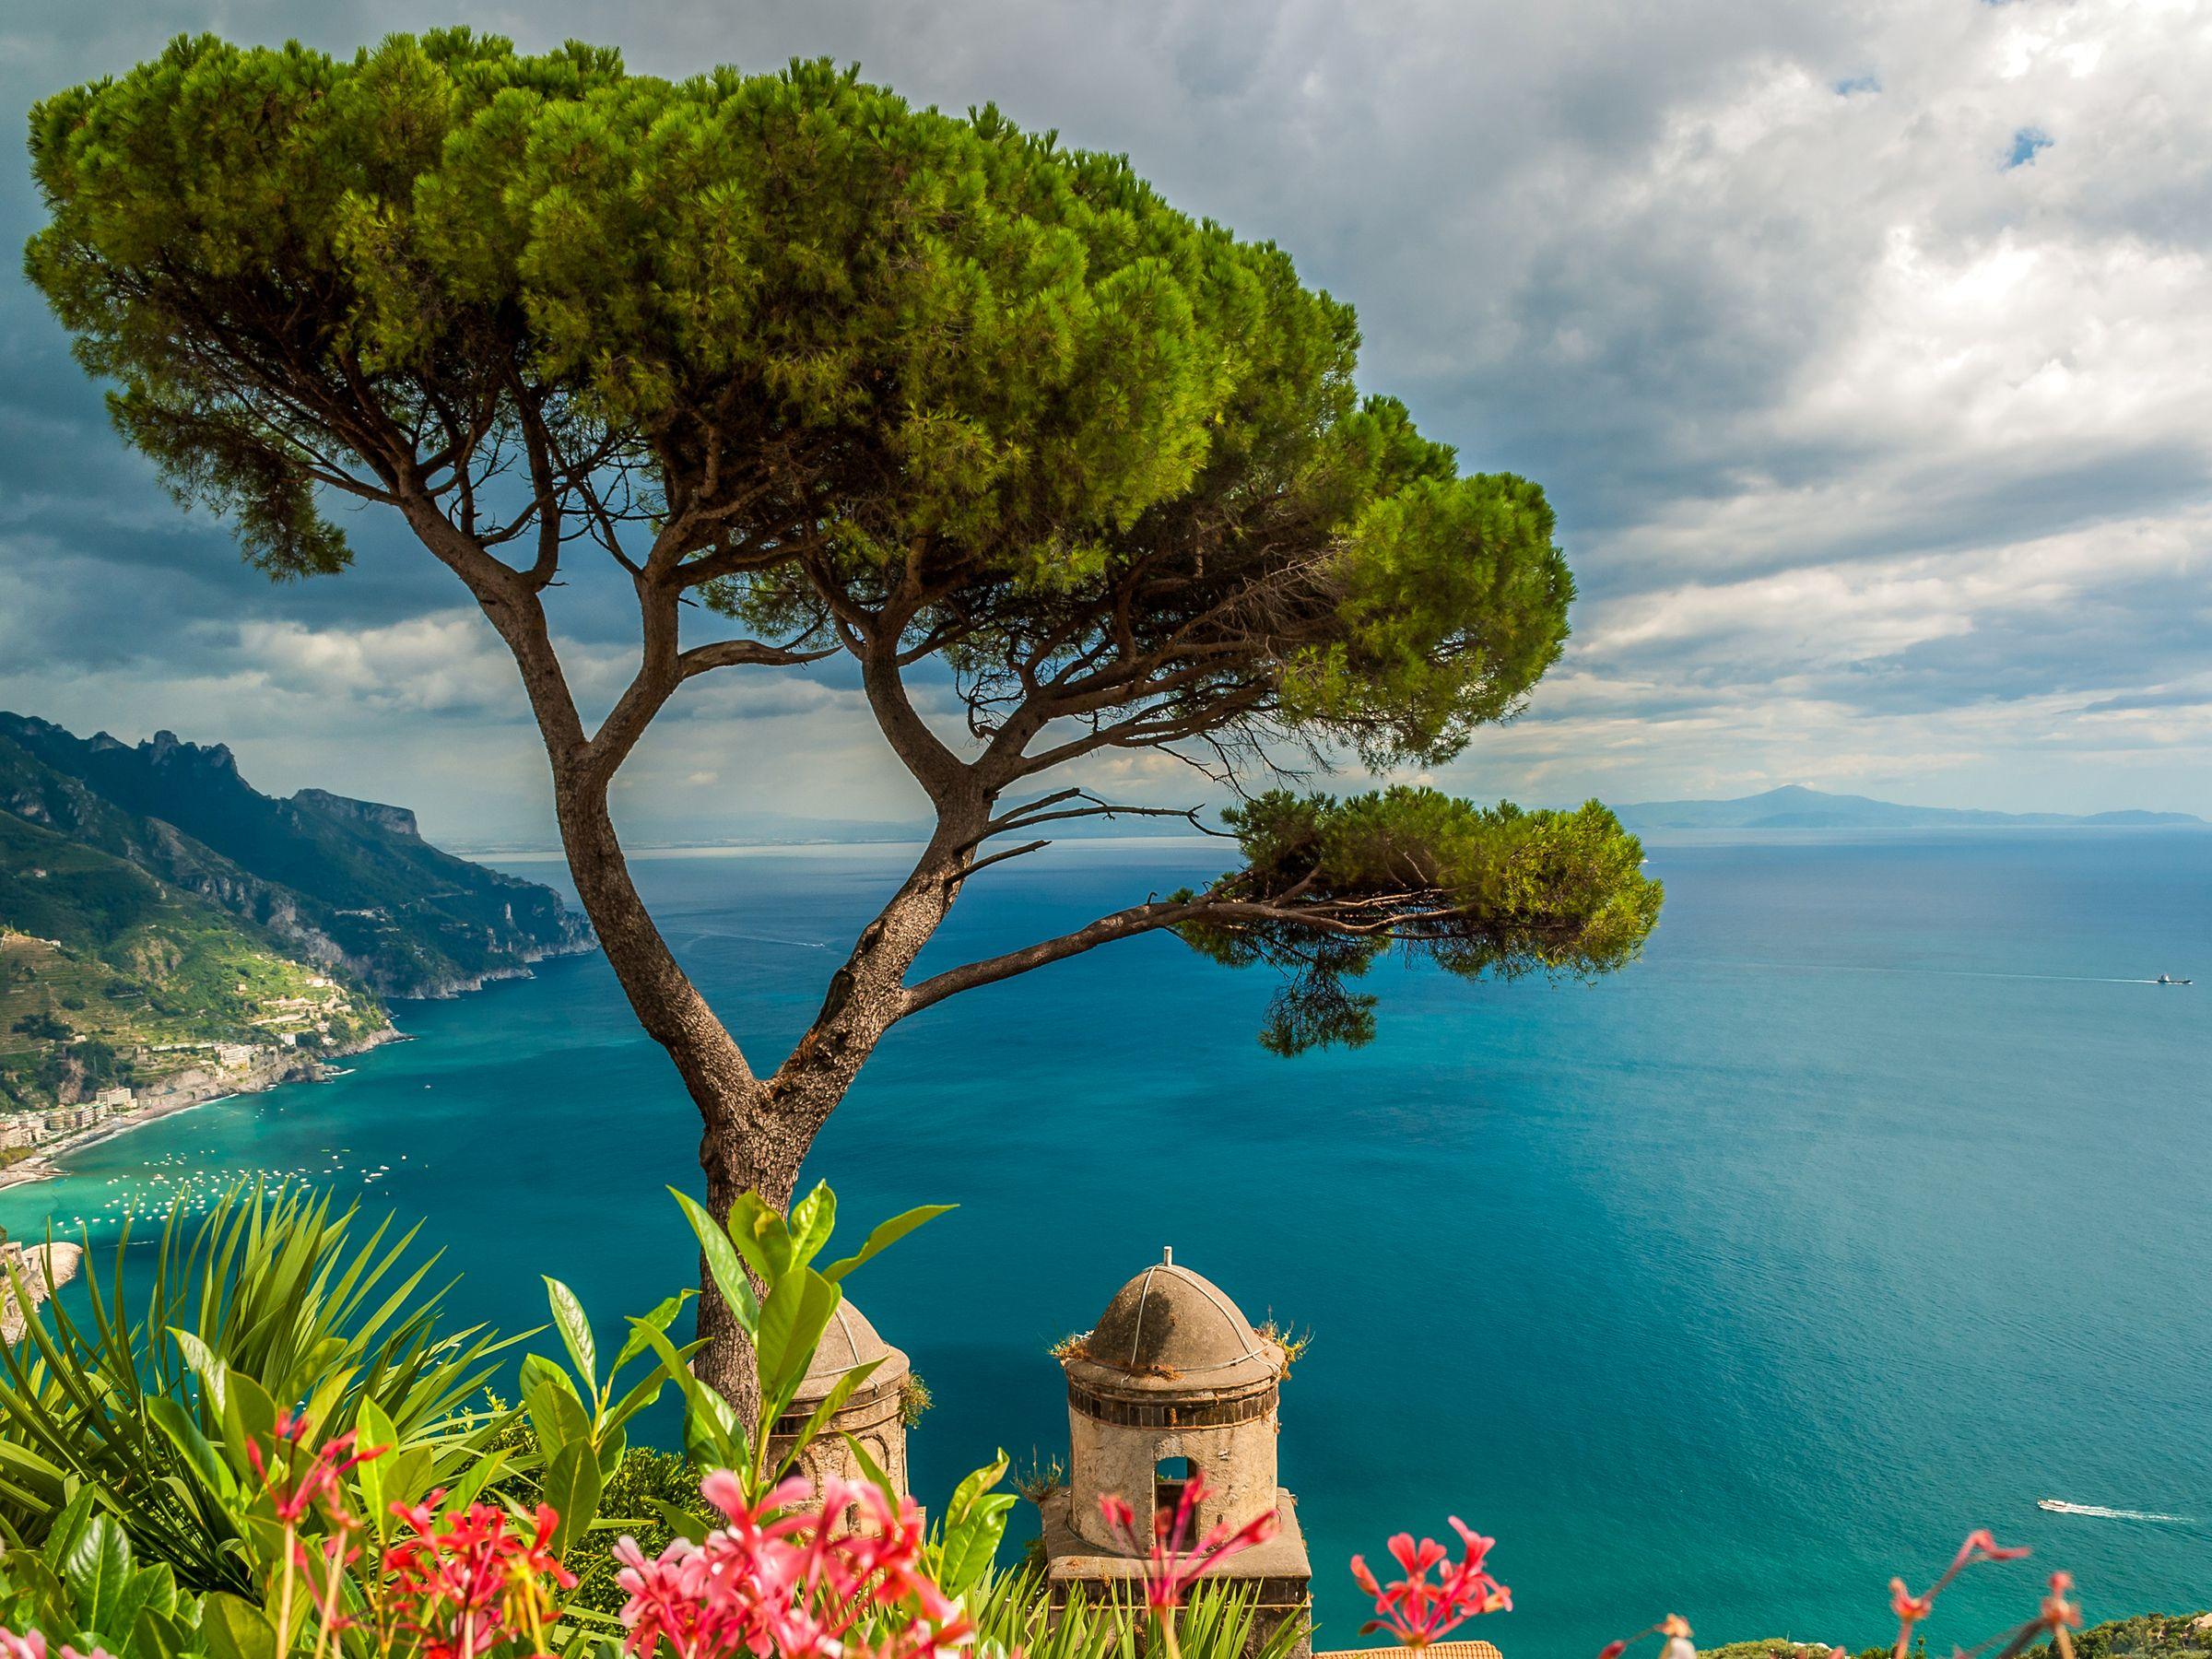 Fonds D Ecran Italie Mer Cote Ravello Arbres Nature Image 491013 Telecharger Italie Paysage Cote Amalfitaine Voyage Italie